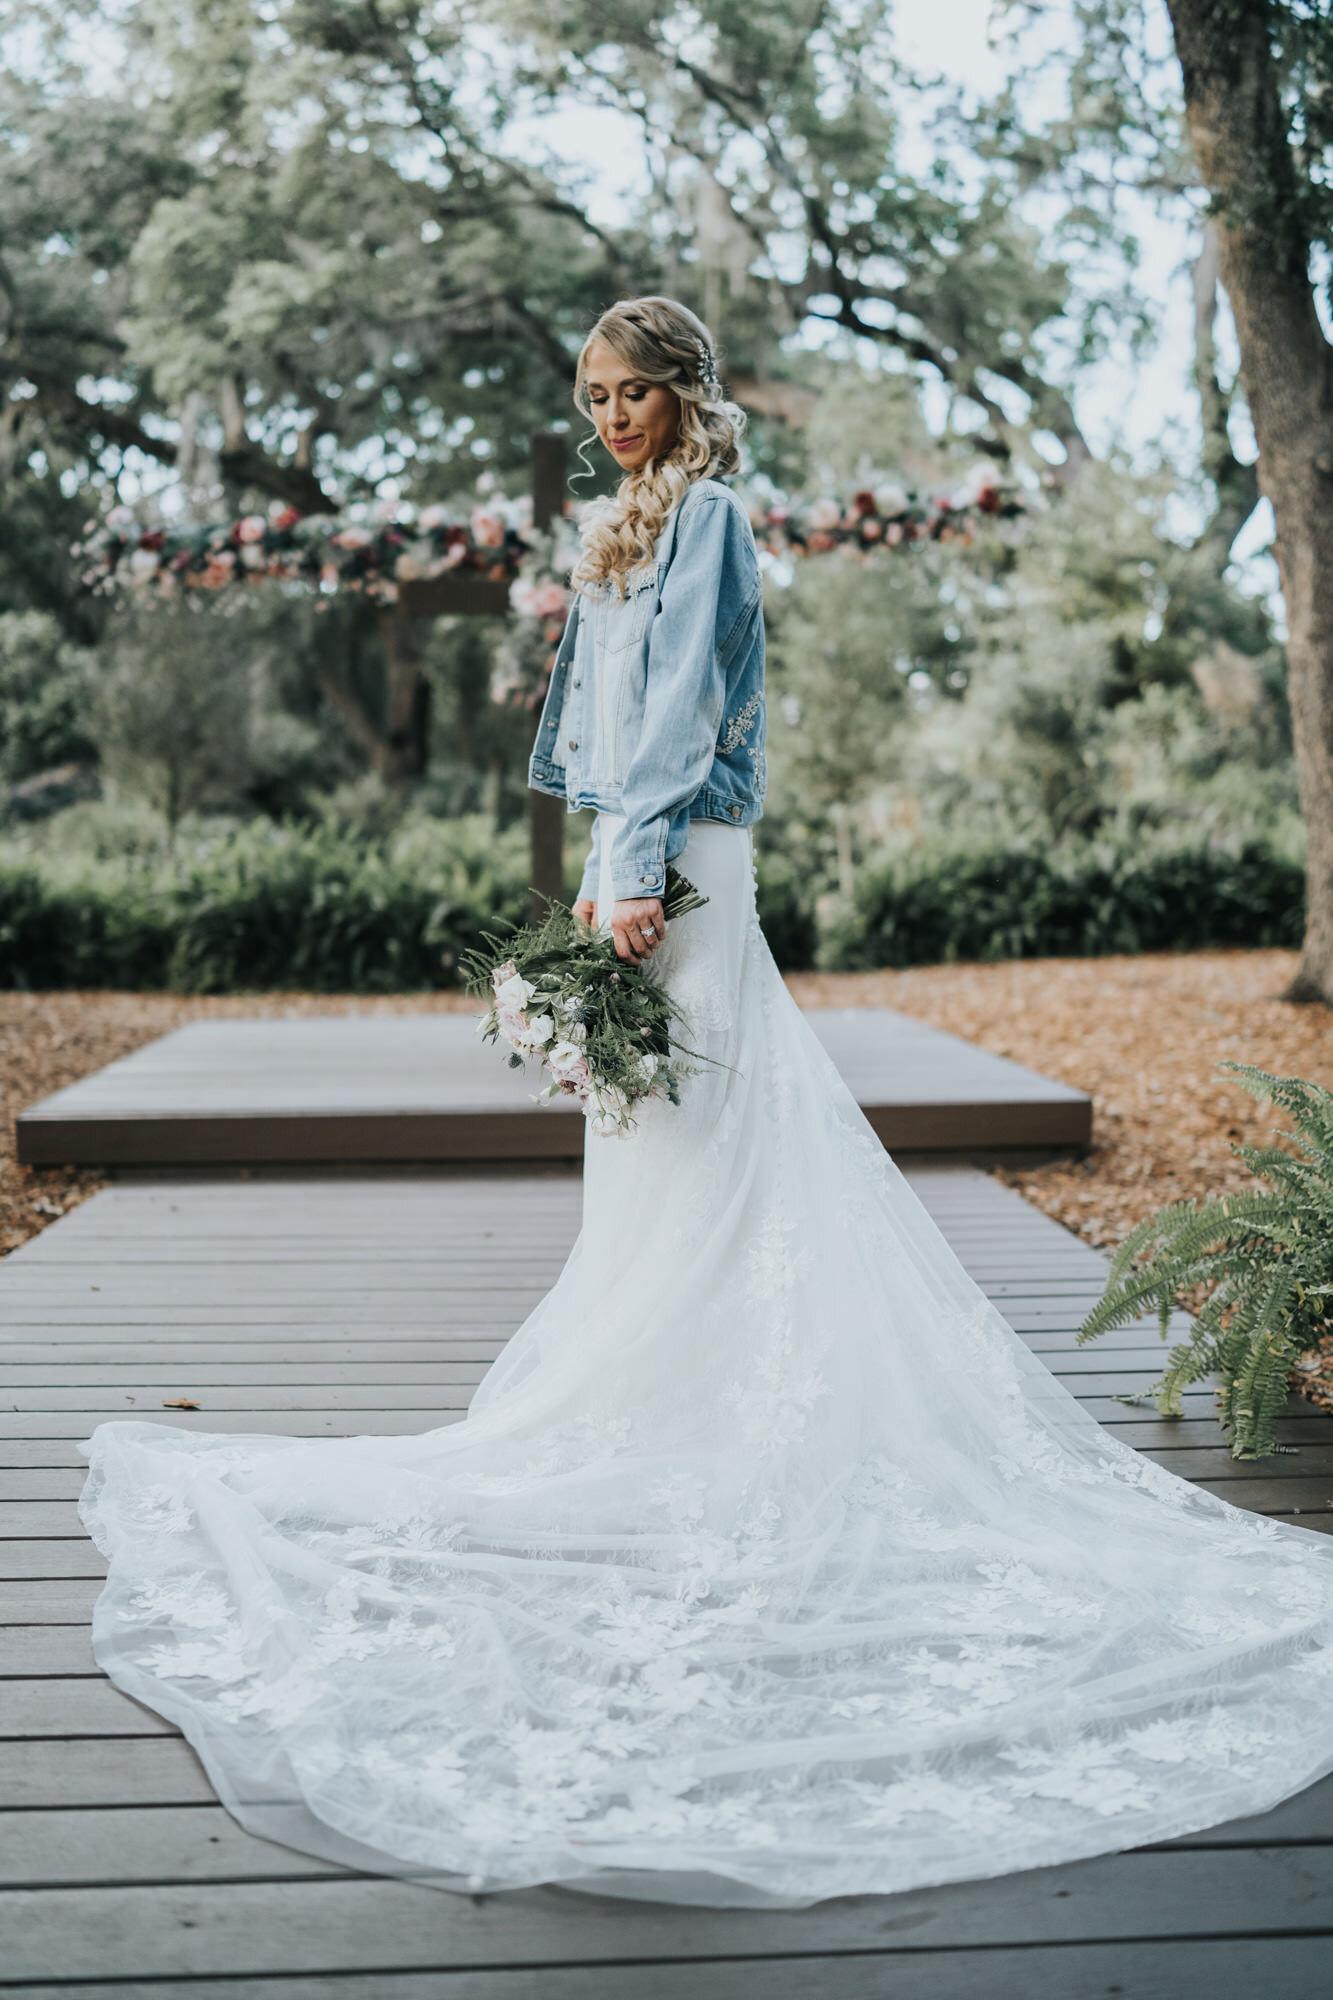 349Sean_Emily_Wedding_3-30-19.jpg